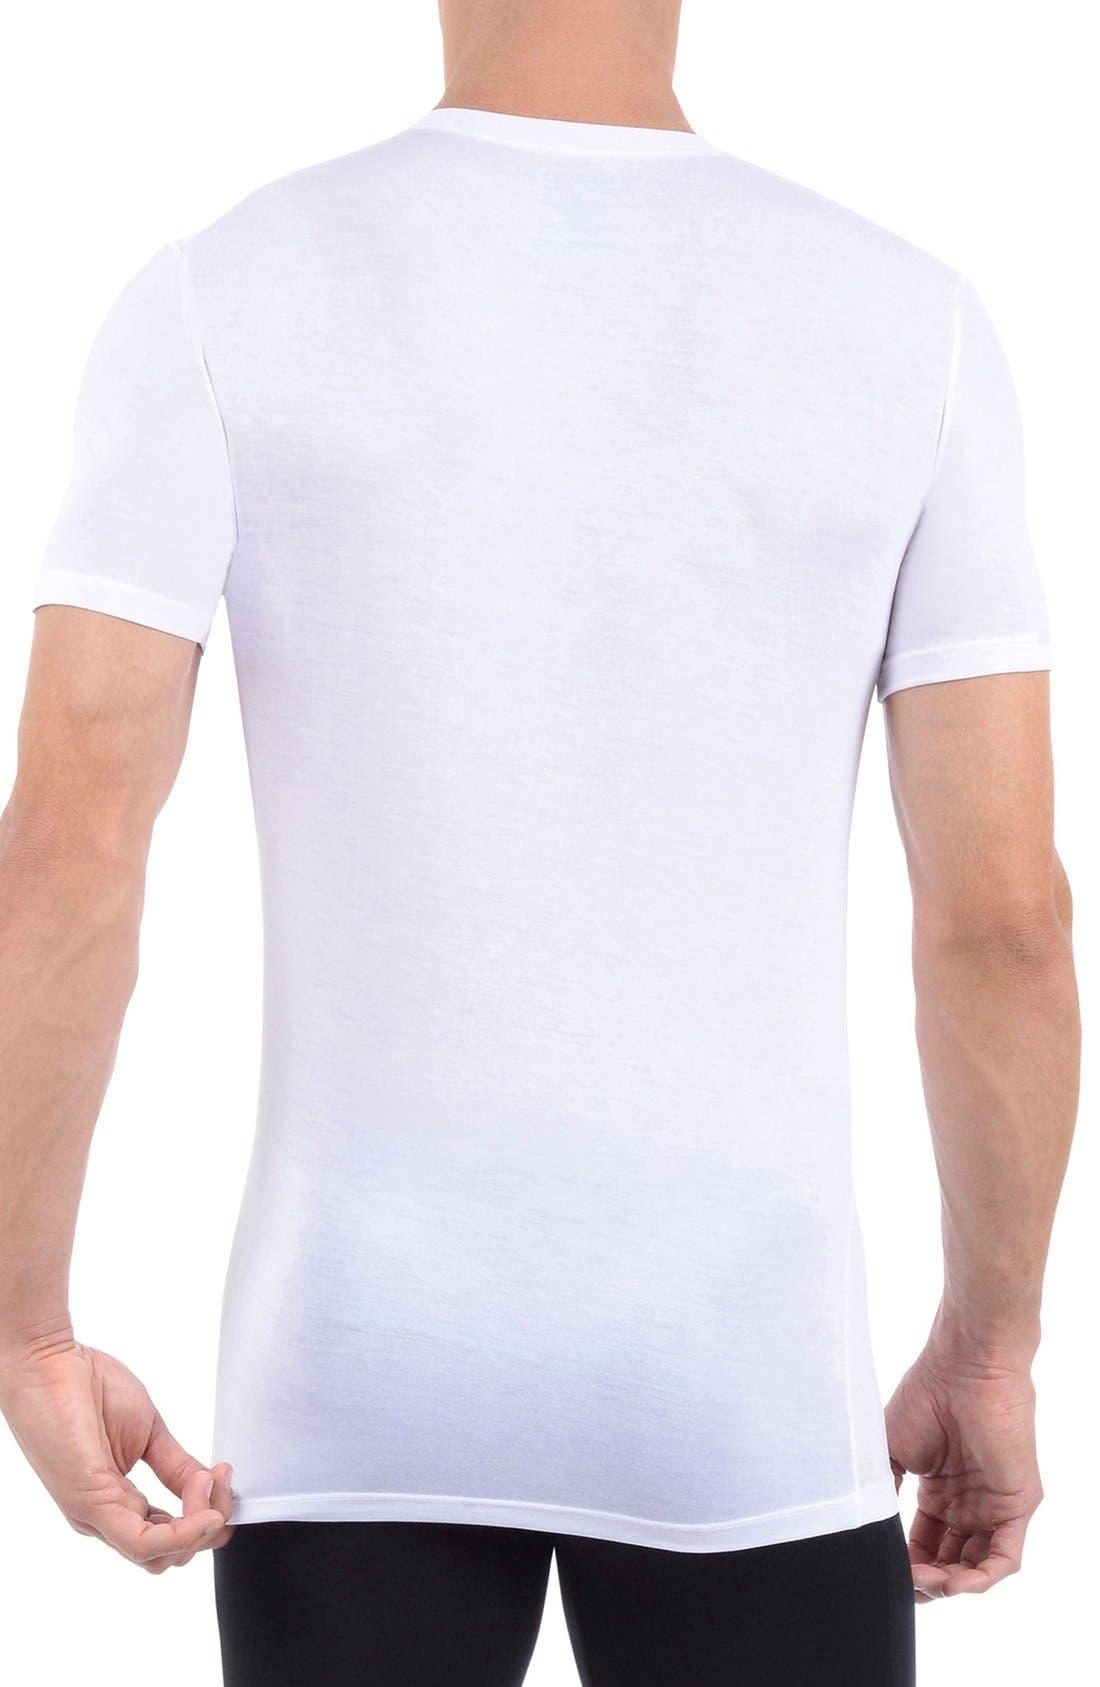 Alternate Image 2  - Tommy John 'Second Skin' High V-Neck Undershirt